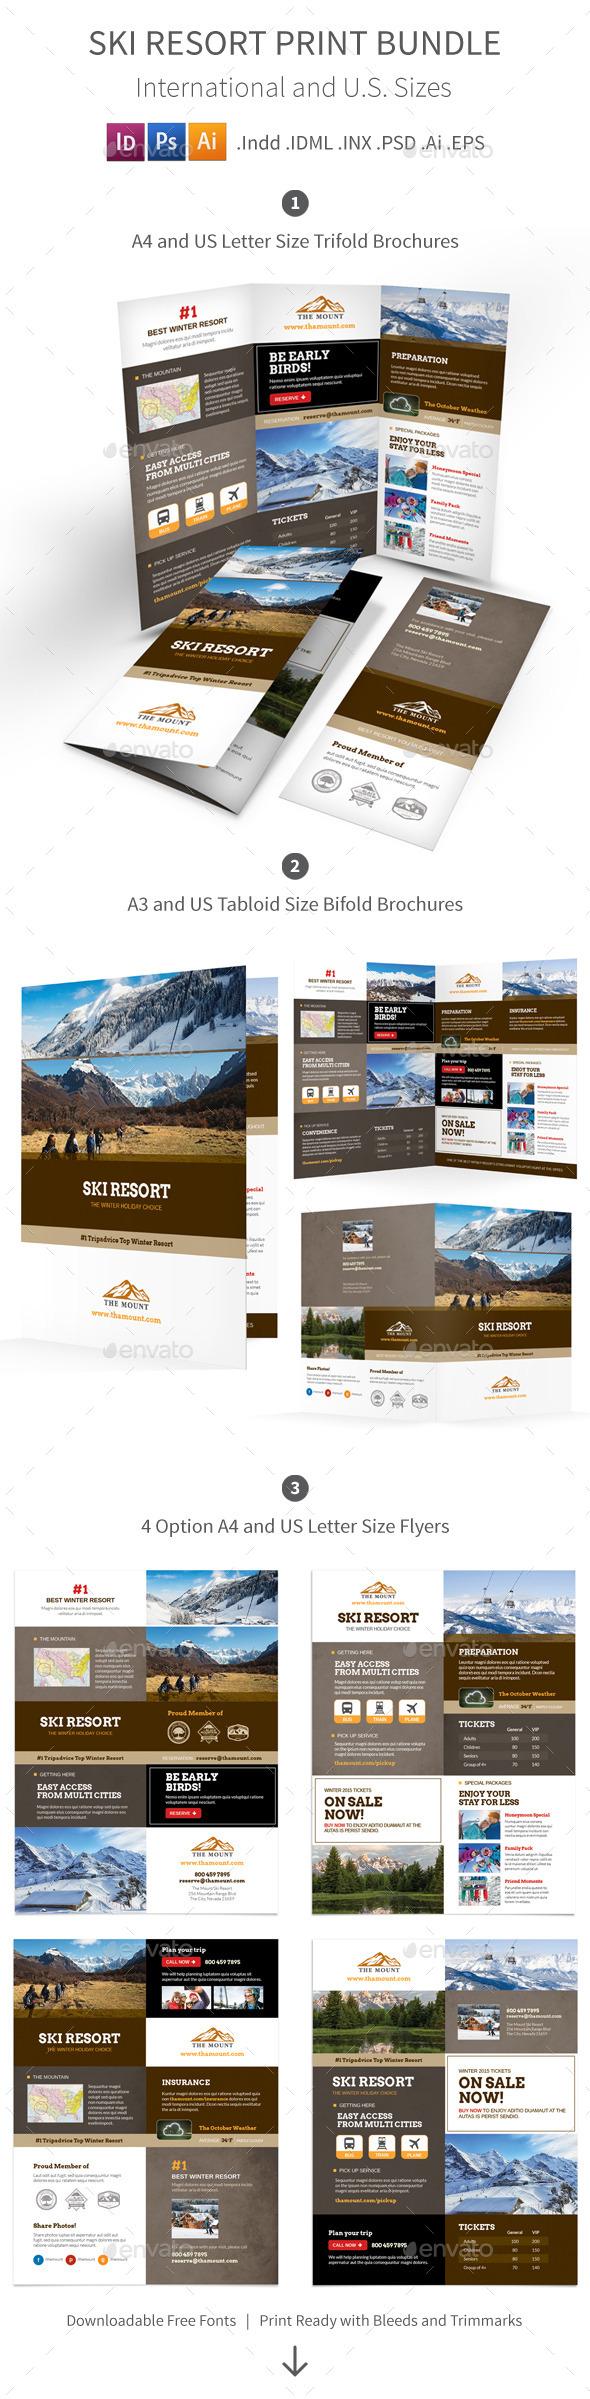 Ski Resort Print Bundle - Informational Brochures